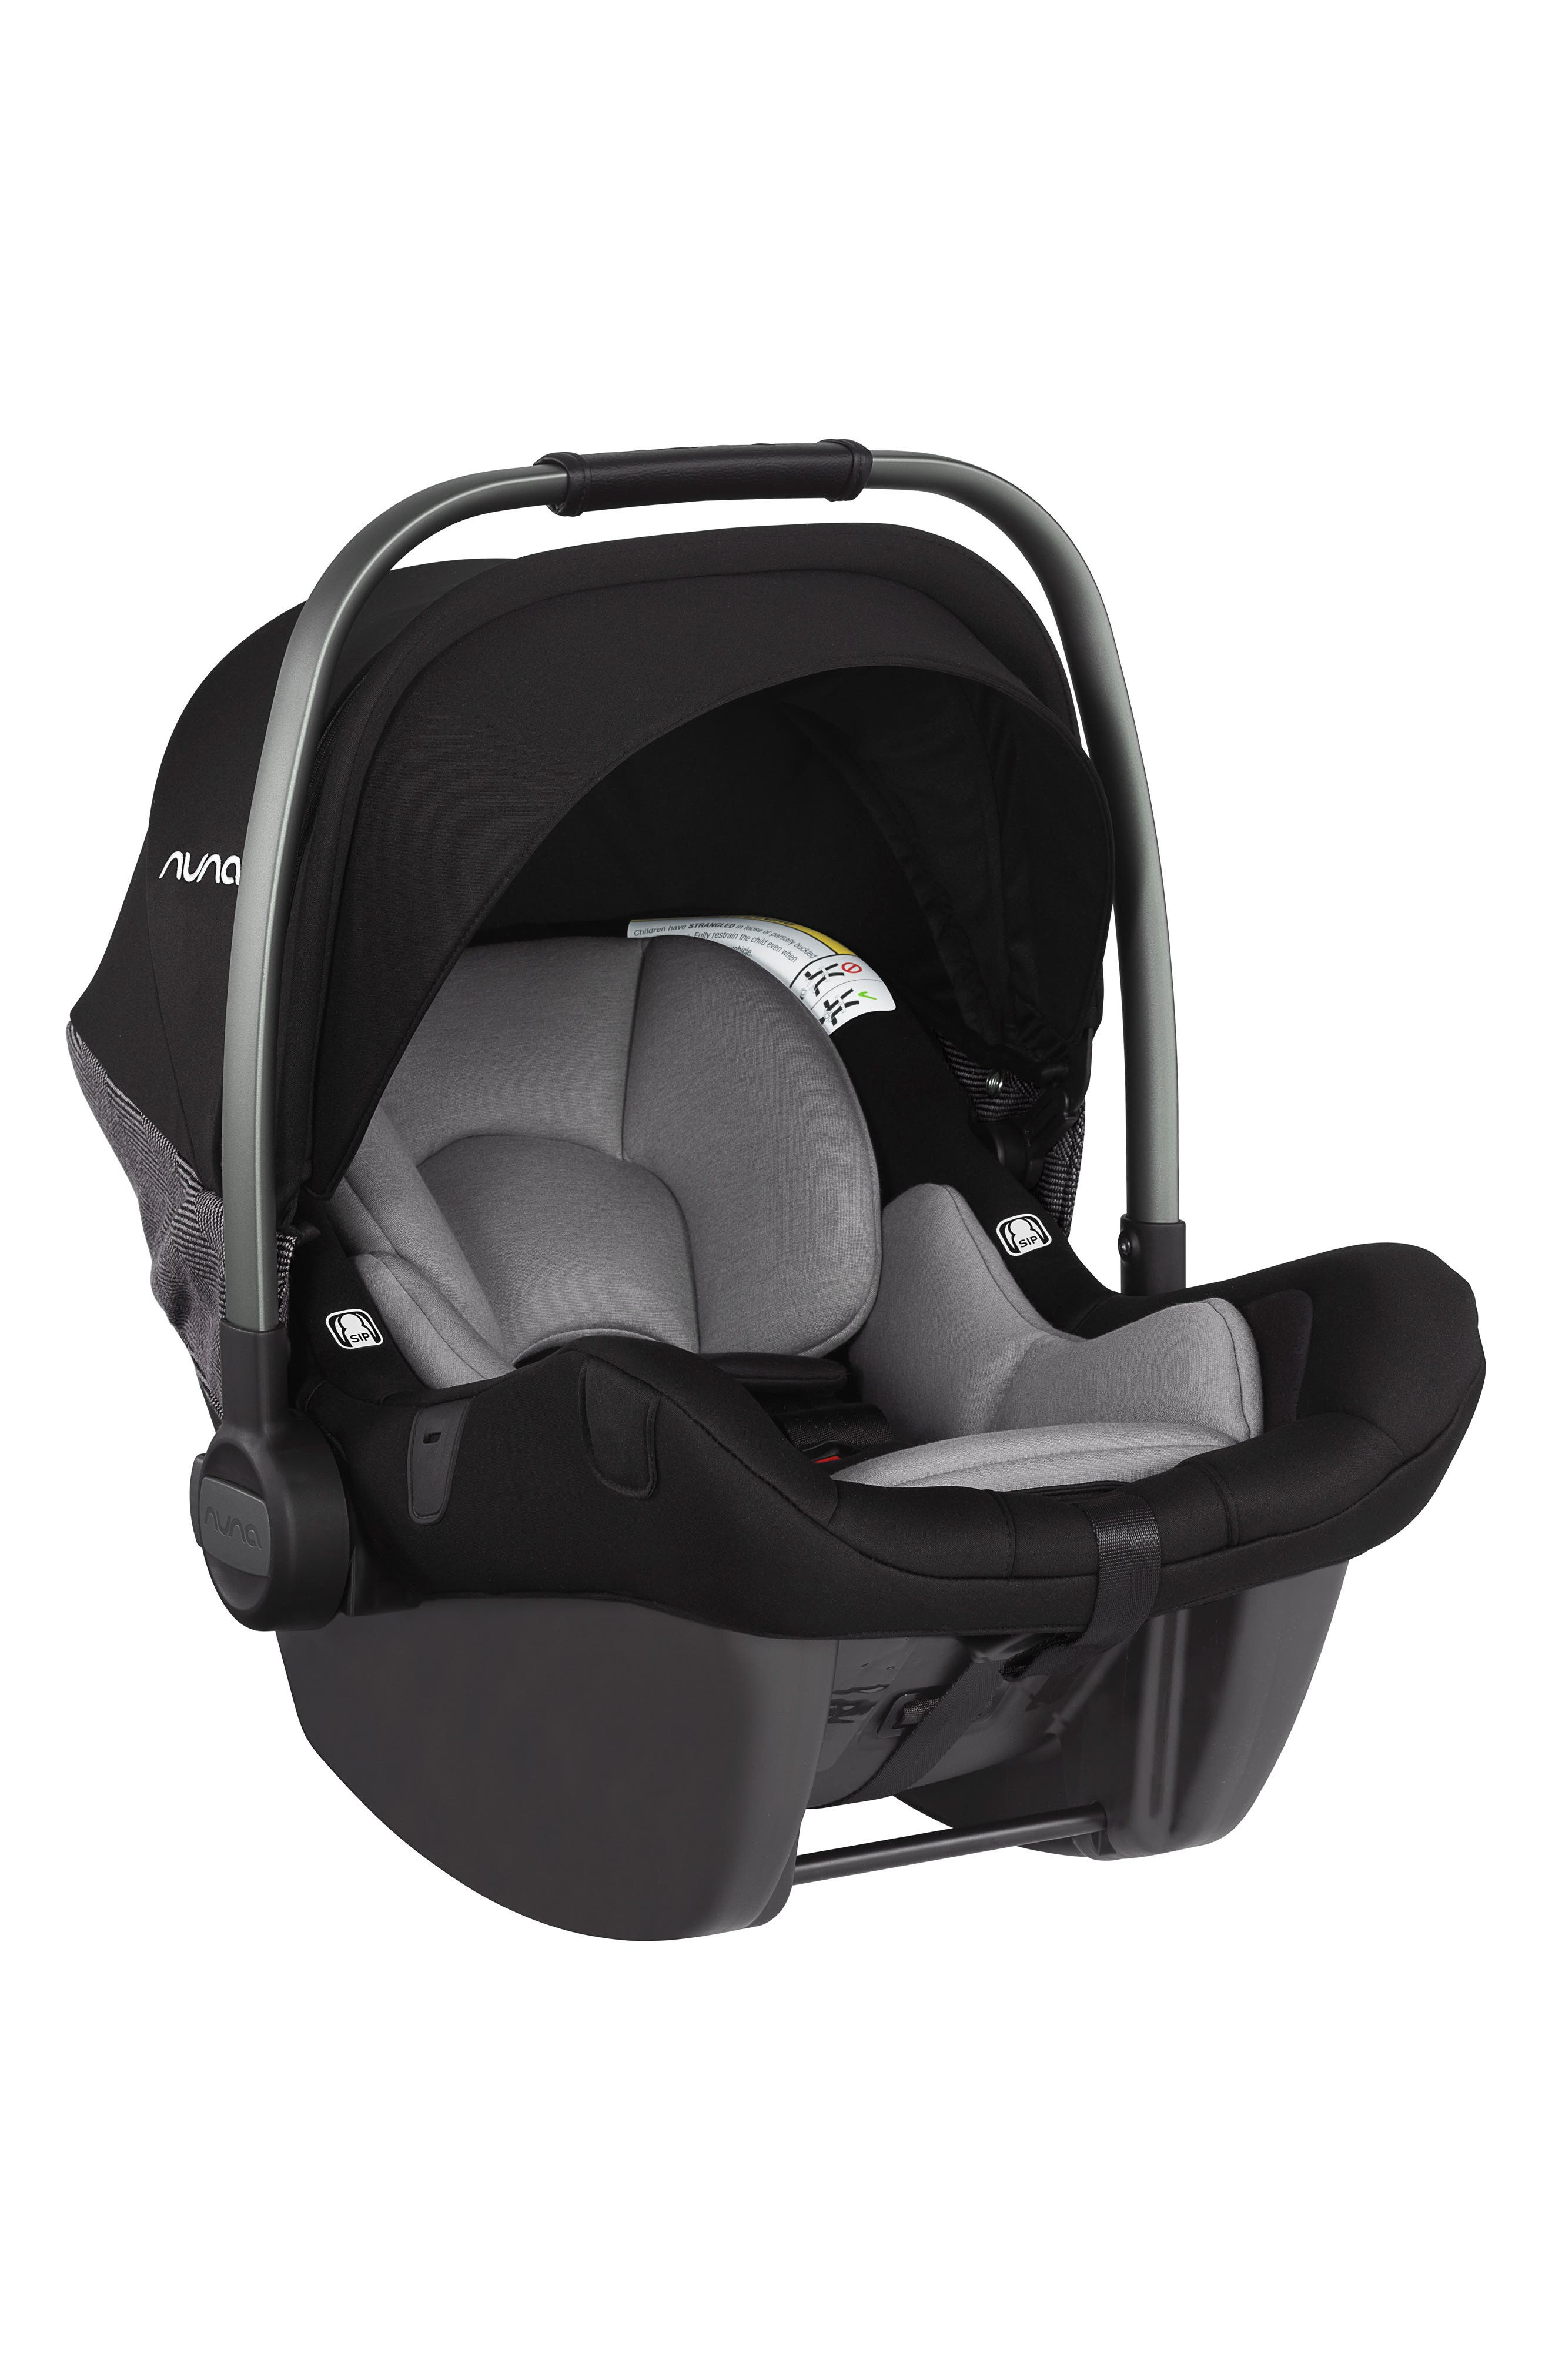 2019 MIXX<sup>™</sup> Stroller & PIPA<sup>™</sup> Lite LX Infant Car Seat Set Travel System,                             Alternate thumbnail 16, color,                             Verona Caviar